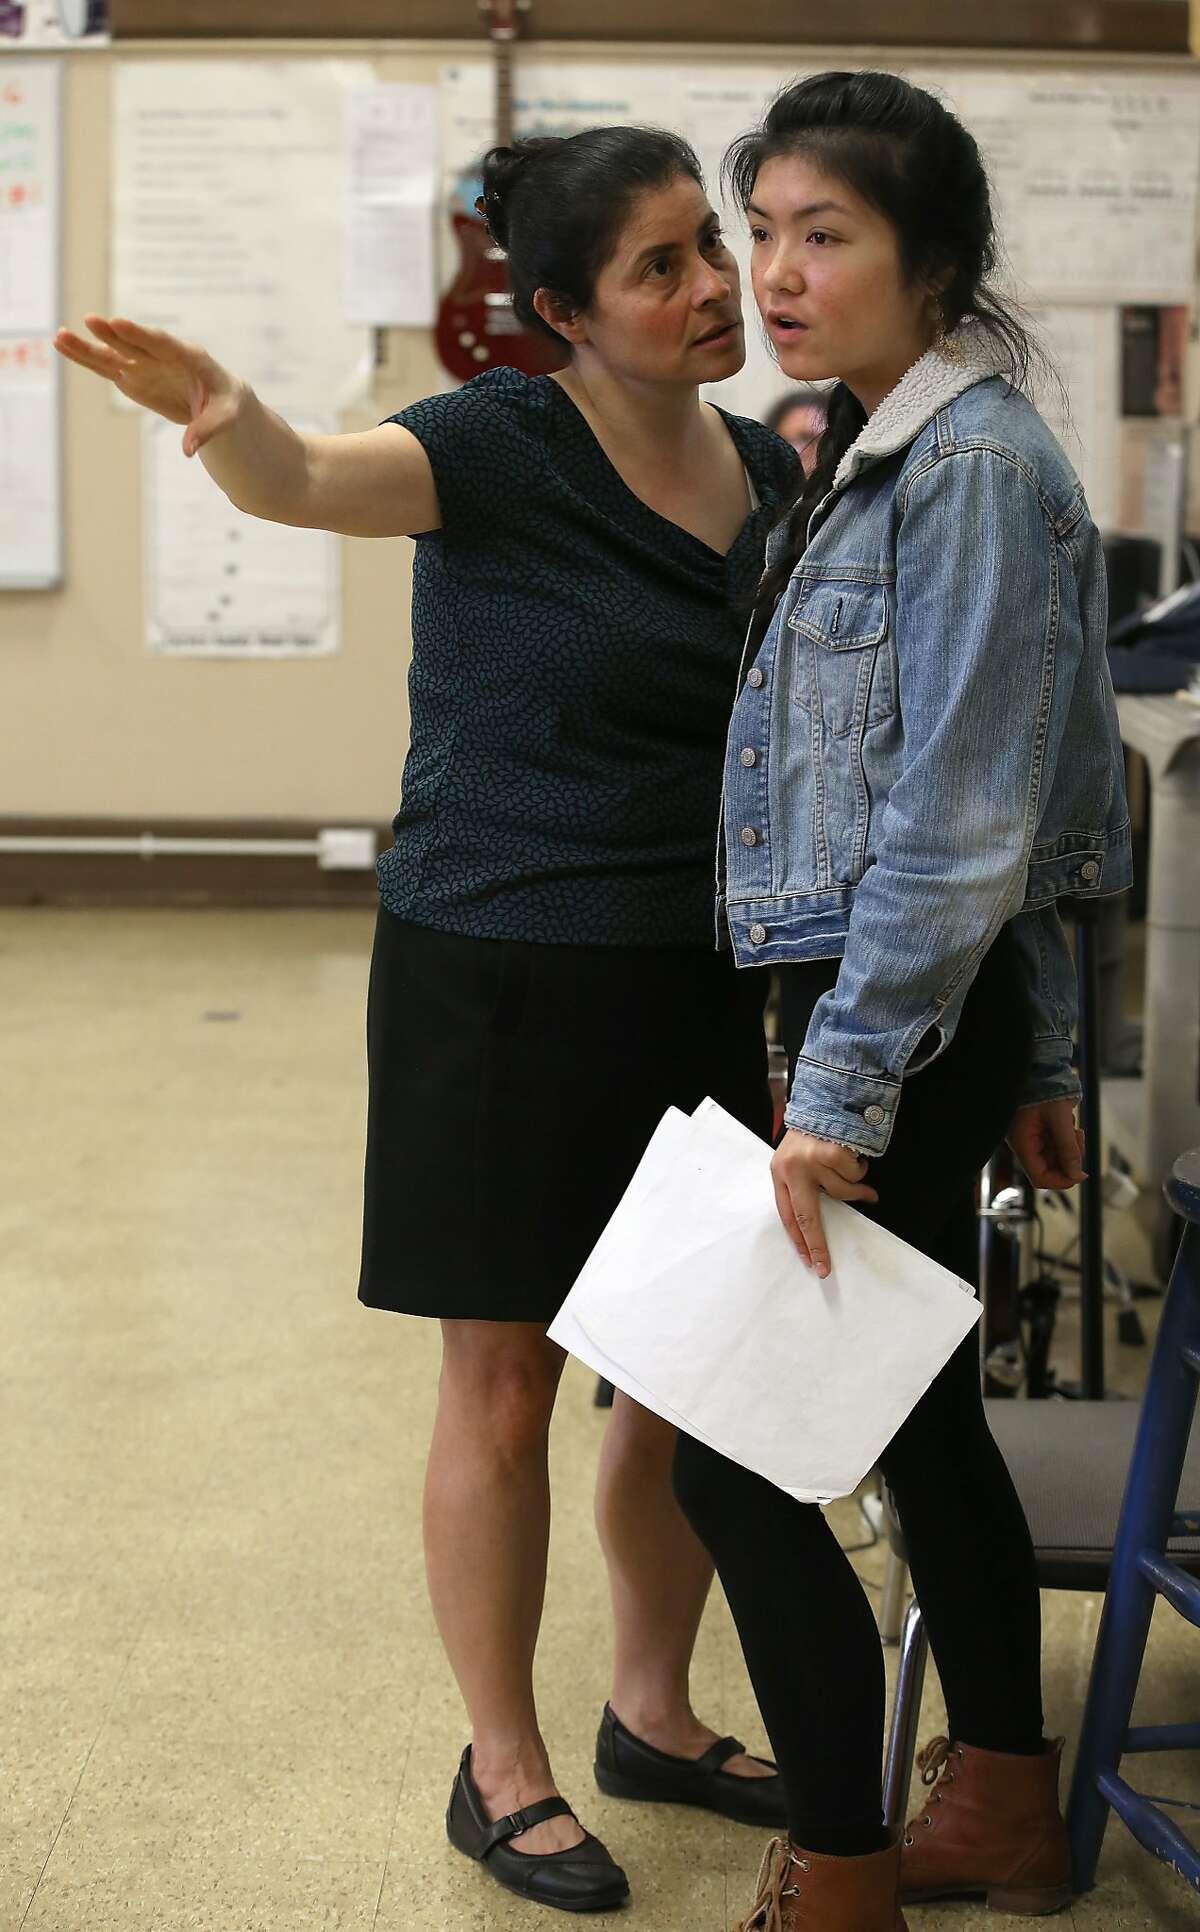 Drama teacher Myrna Maroun (left) talks with senior Michelle Zheng (right), 17 years old, in the Little Theater at Galileo High School while teaching students improvisation in San Francisco, California, on Thursday, February 25, 2016.